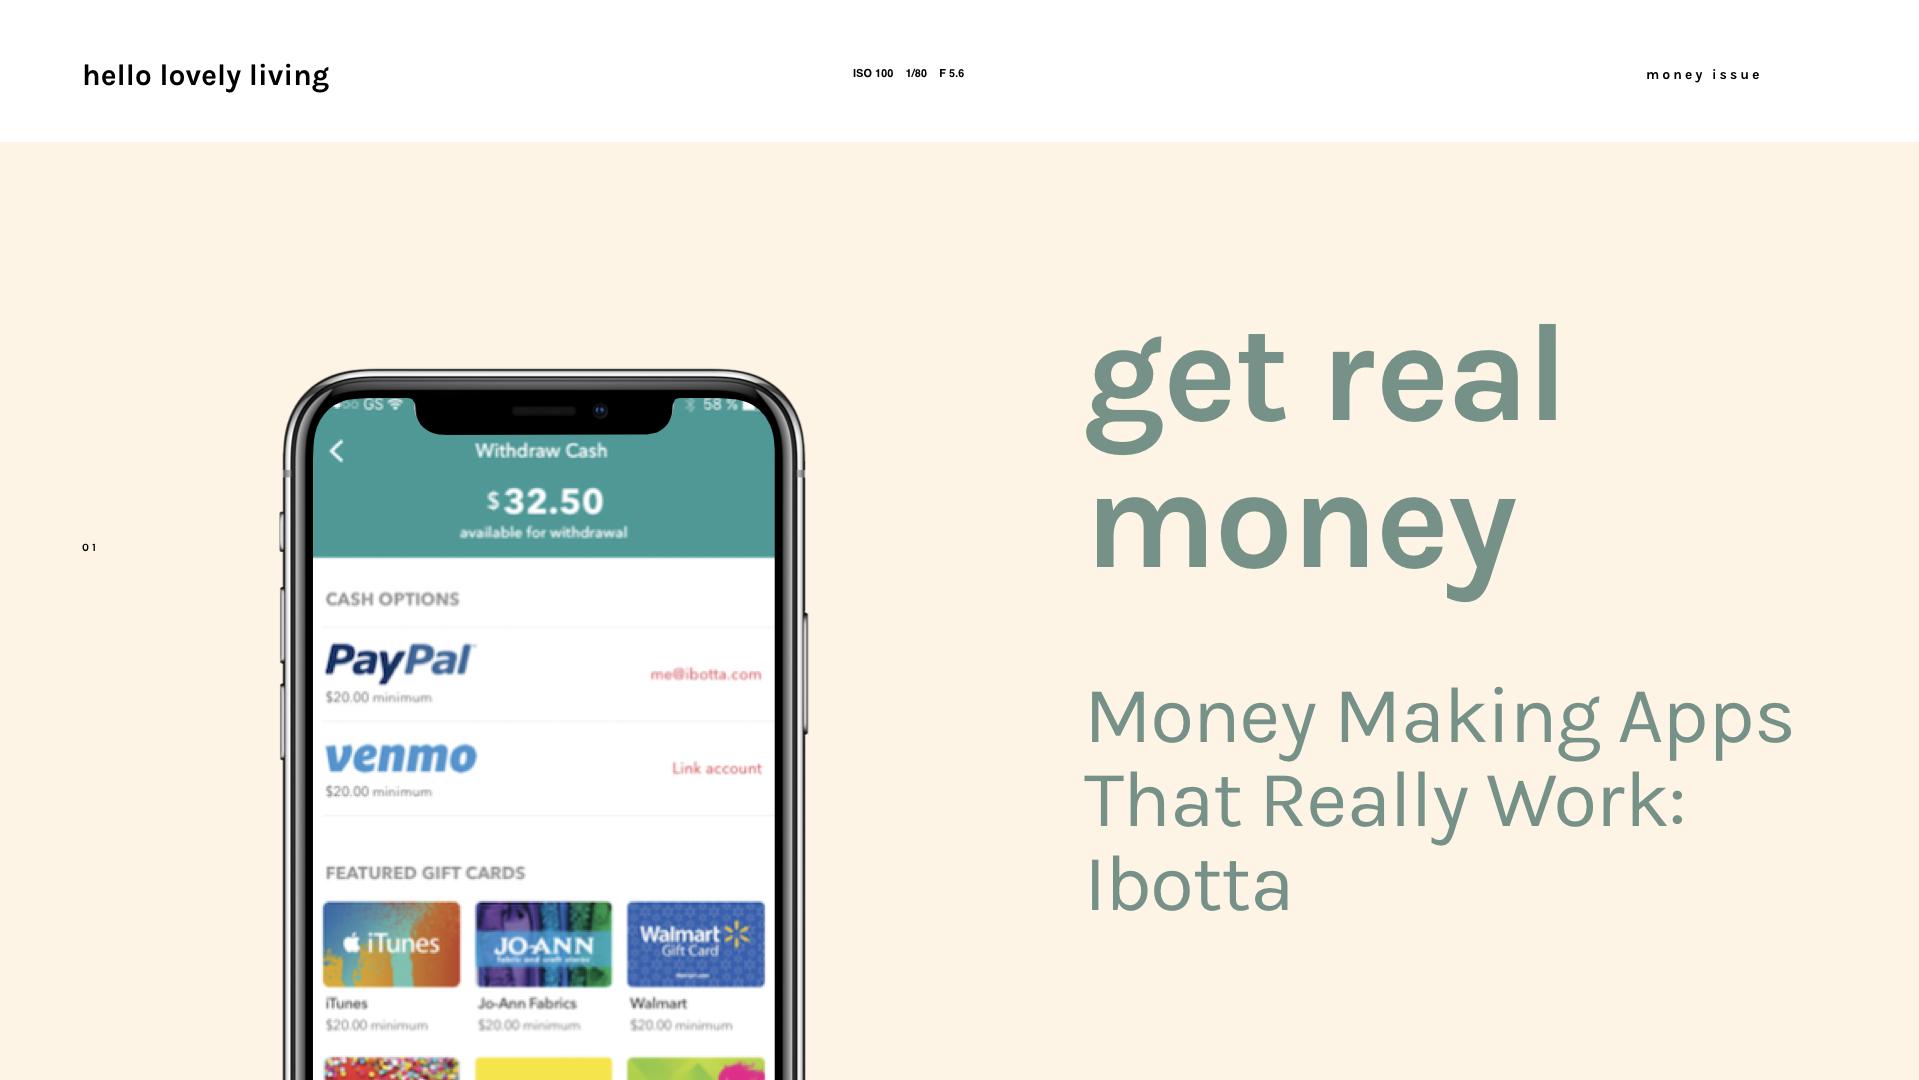 hellolovelyliving.com | Get Real Money | Money Making Apps That Really Work: Ibotta